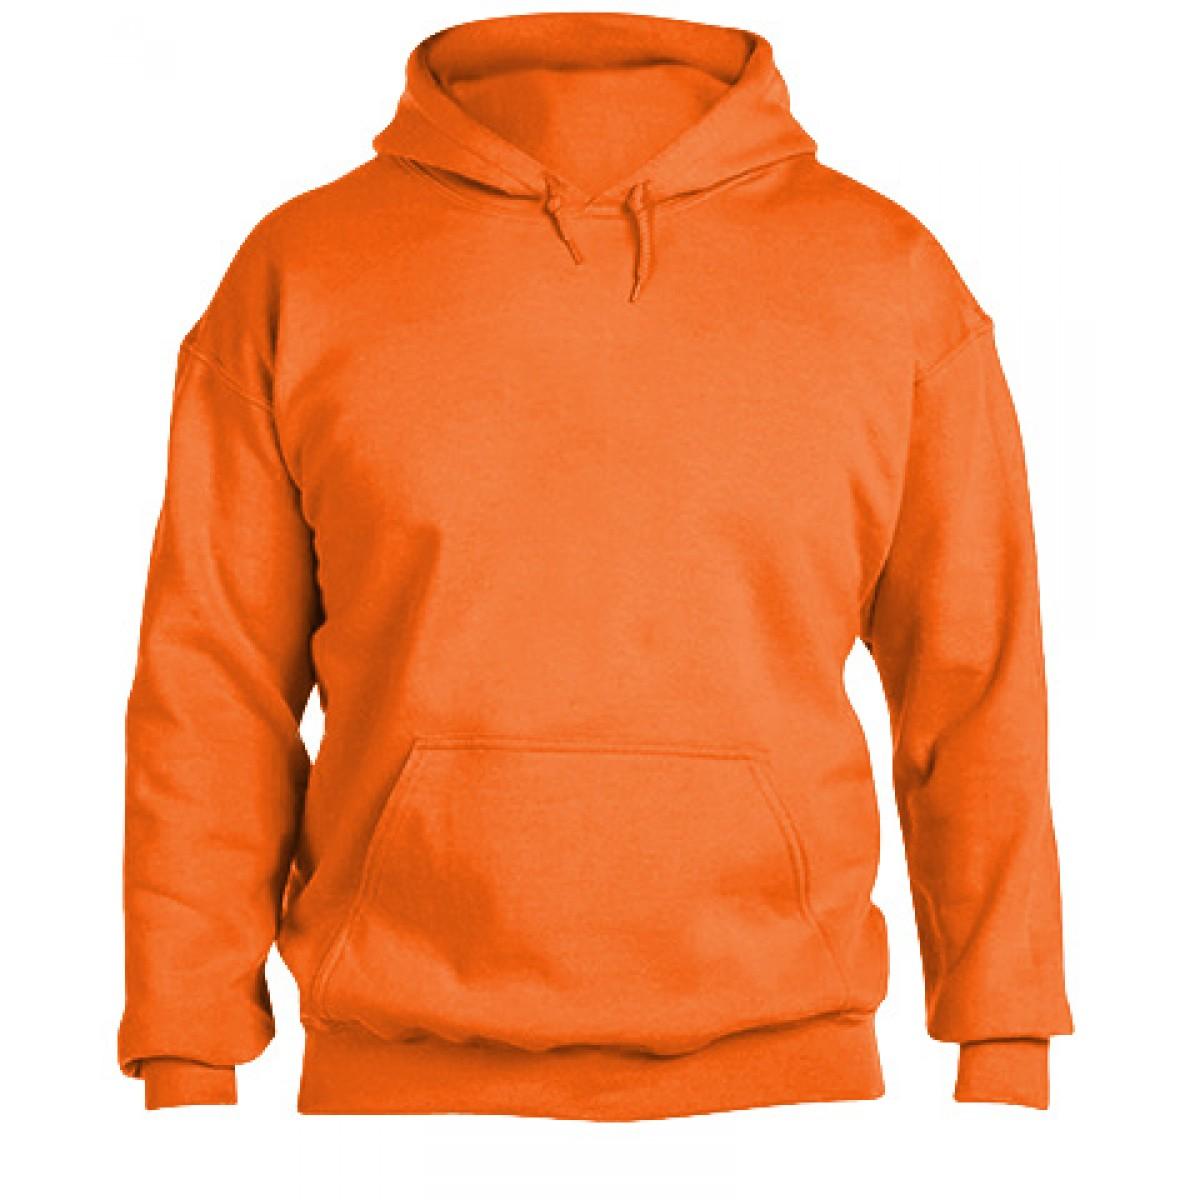 Solid Hooded Sweatshirt  50/50 Heavy Blend-Safety Orange-XL